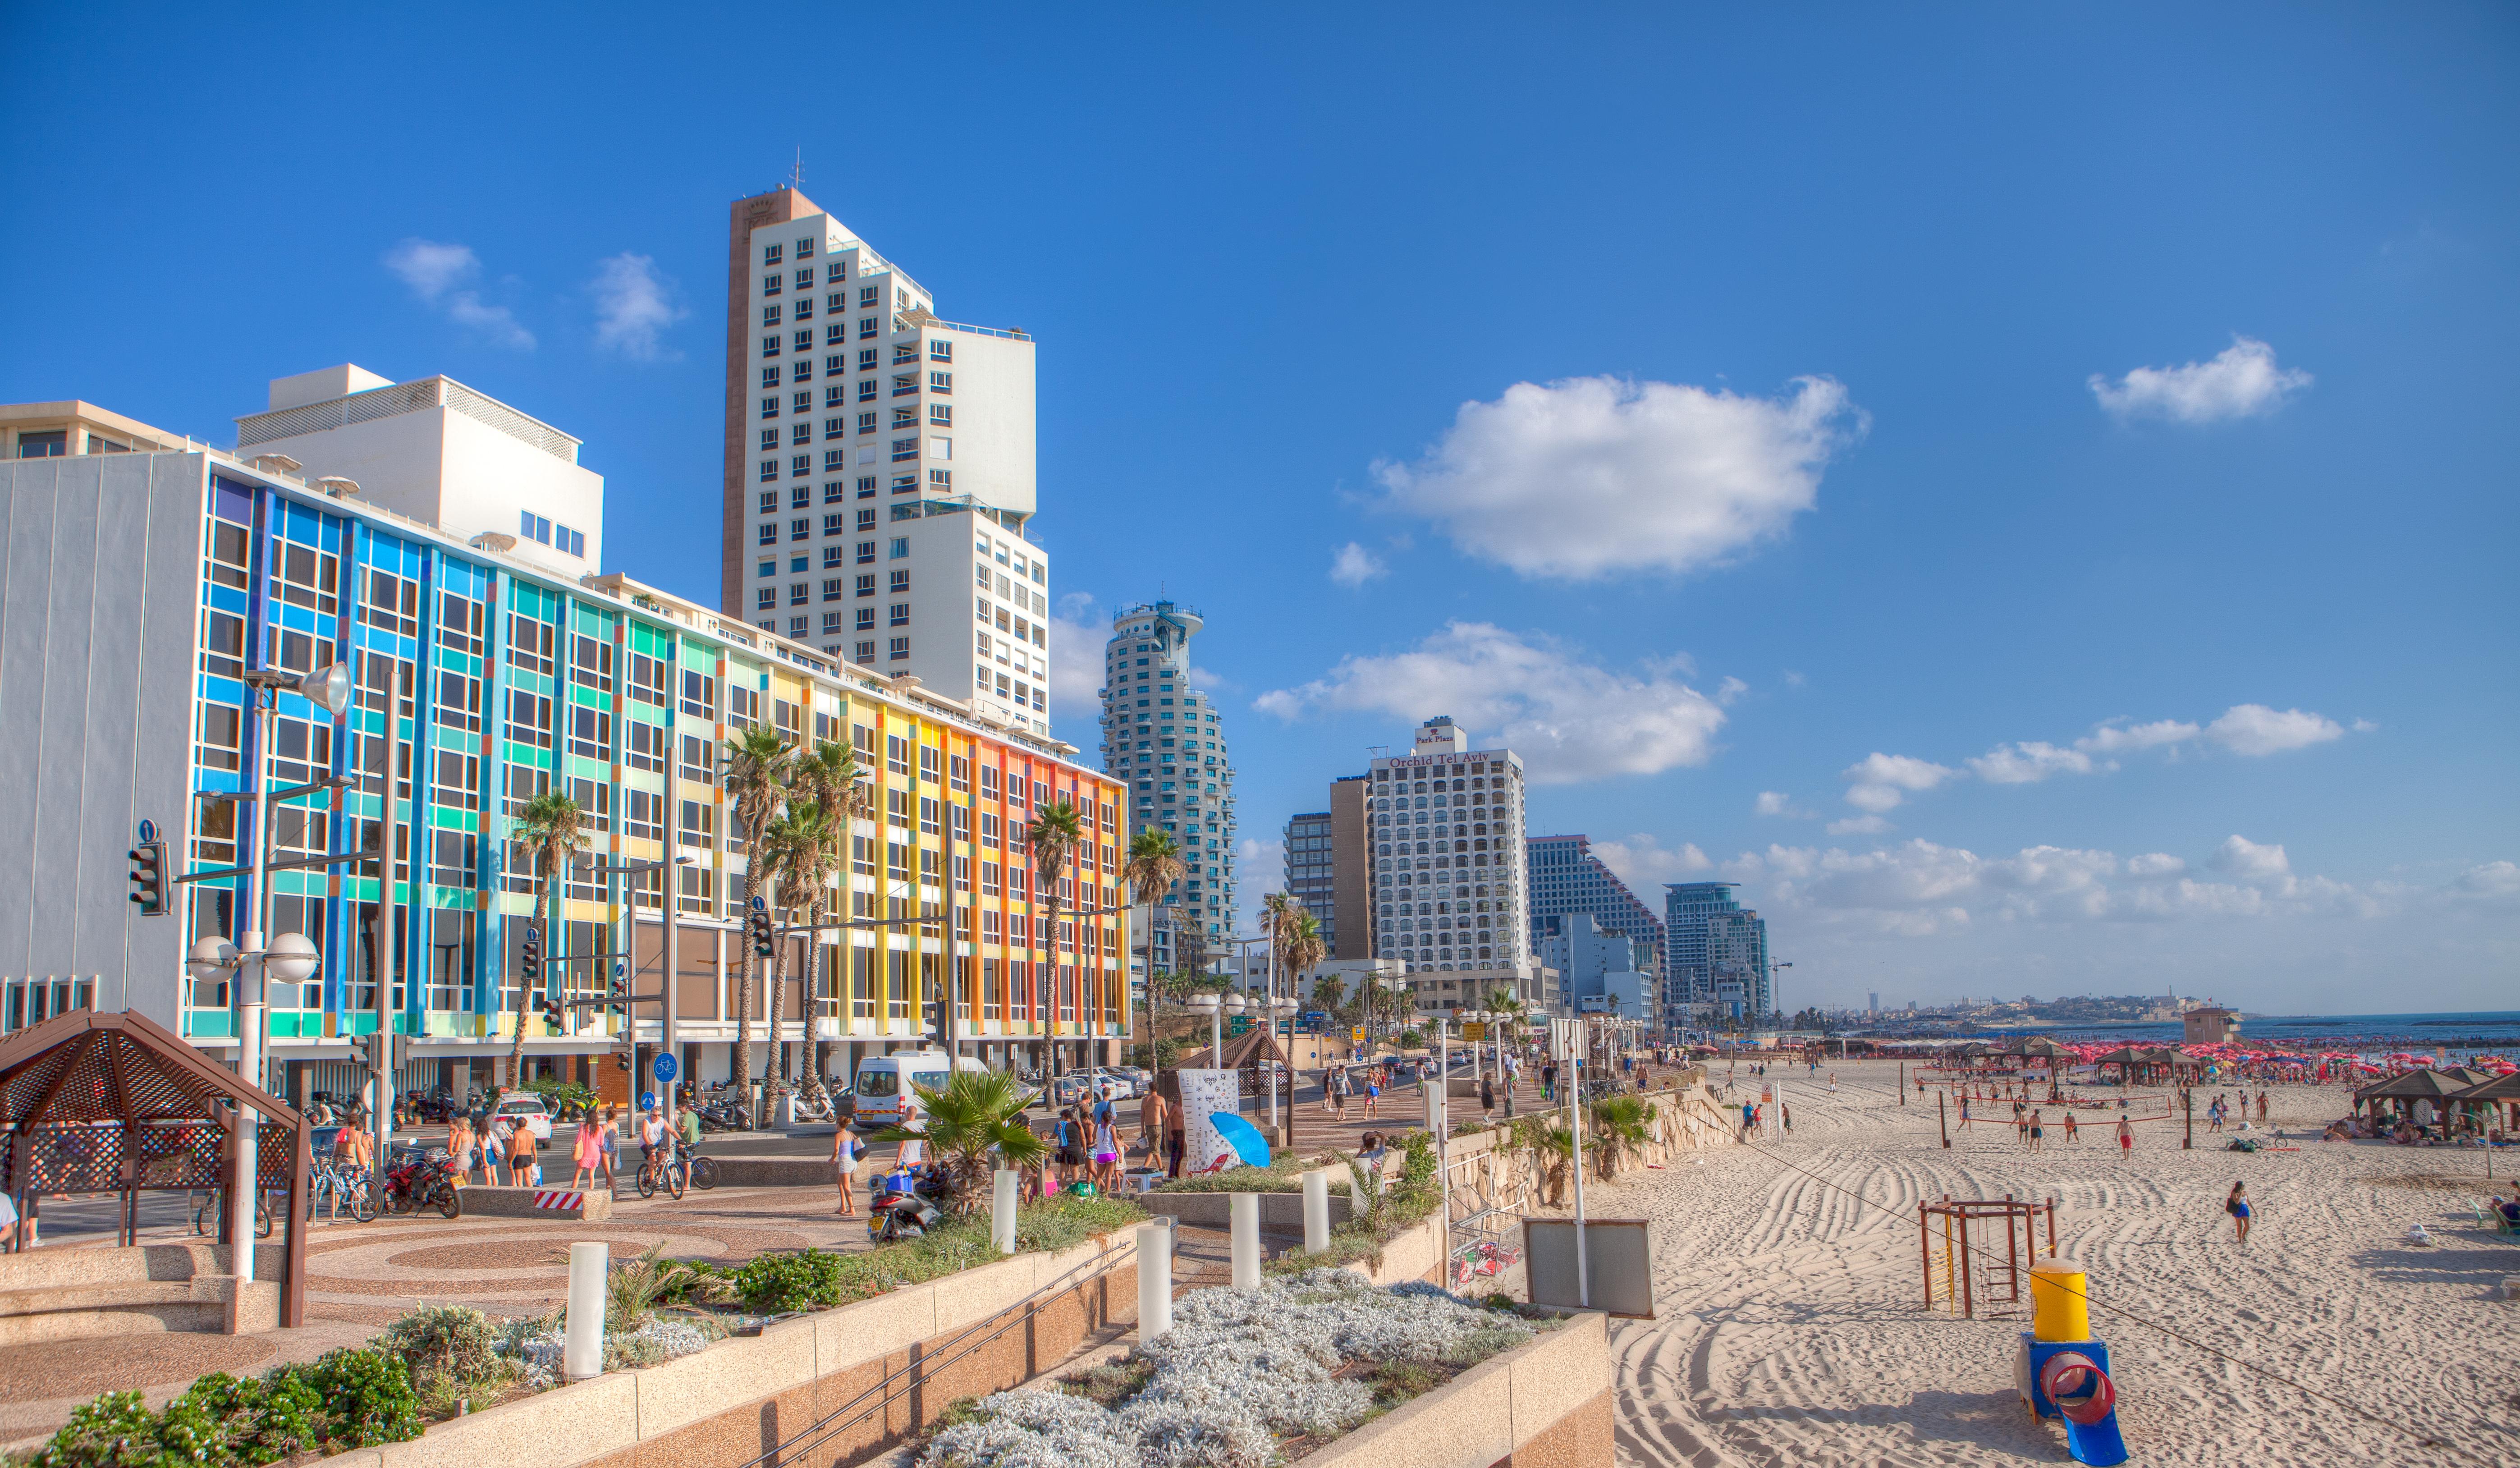 Israel ser stor vækst i ankomster fra de skandinaviske lande. Her er det havnepromenaden i Tel Aviv. Foto: Dana Friedlander, Den Israelske Stats Turistbureau.